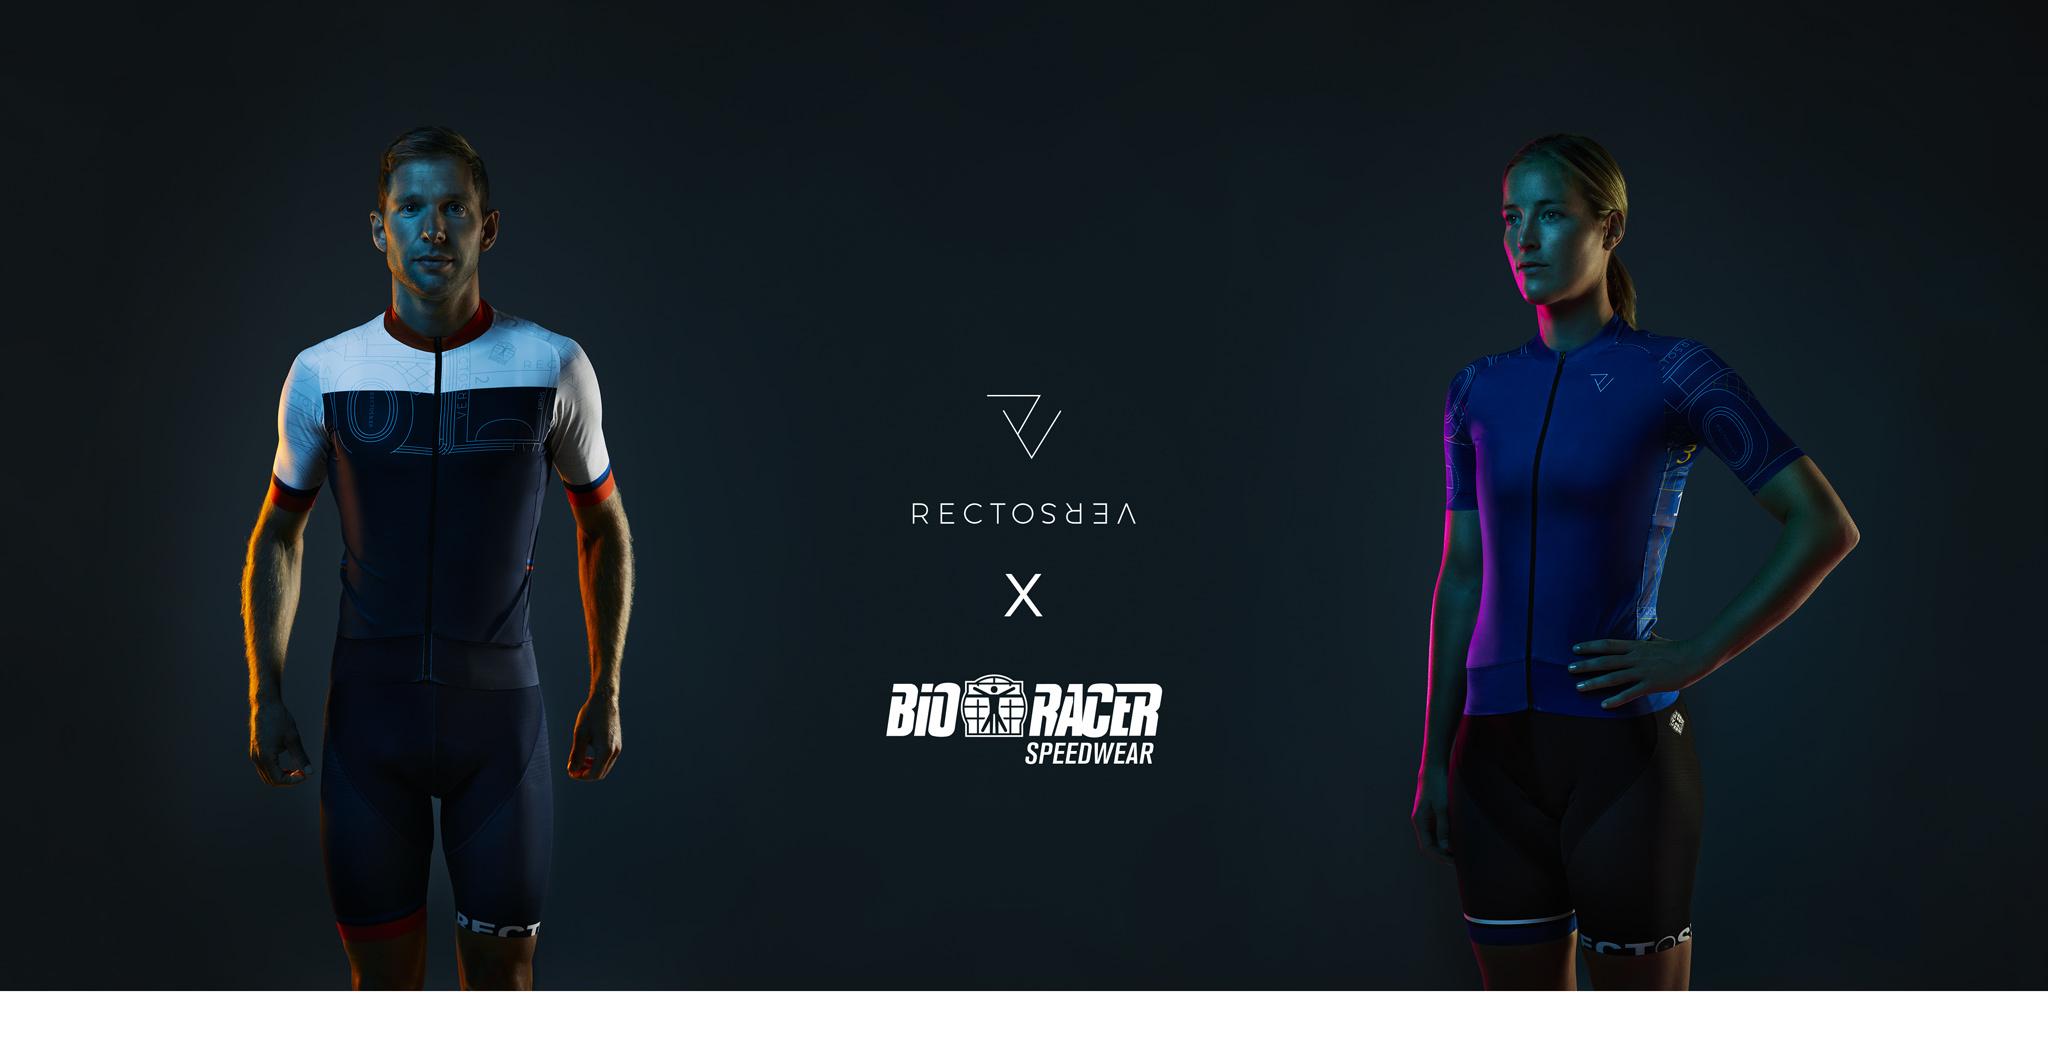 RectoVerso x Bioracer